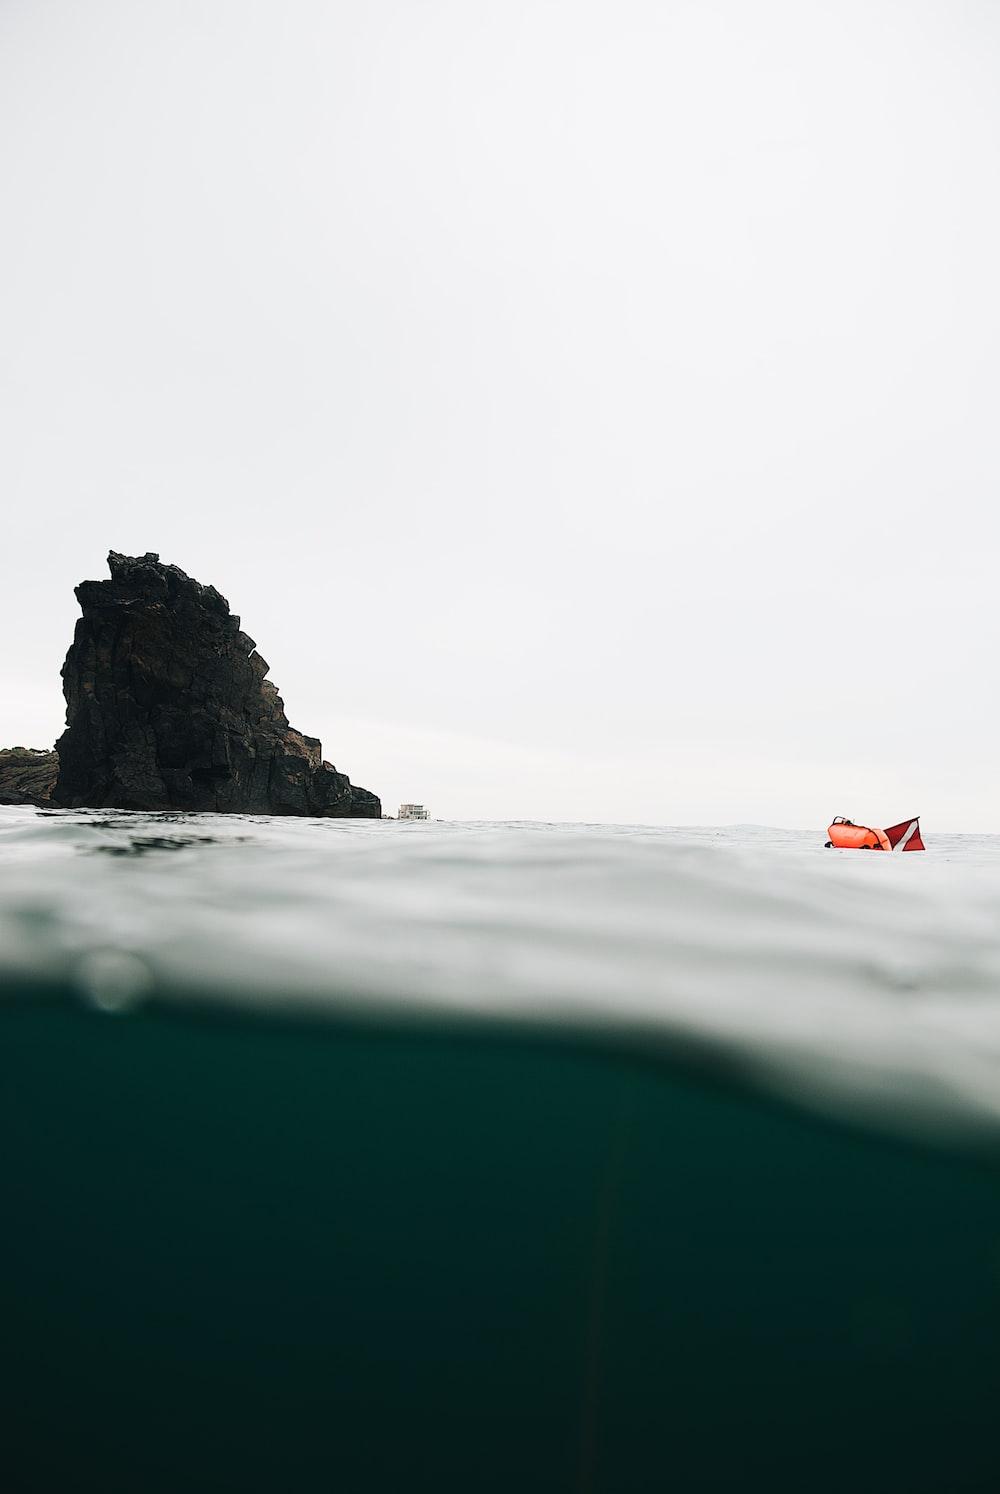 orange and white flag on black rock formation